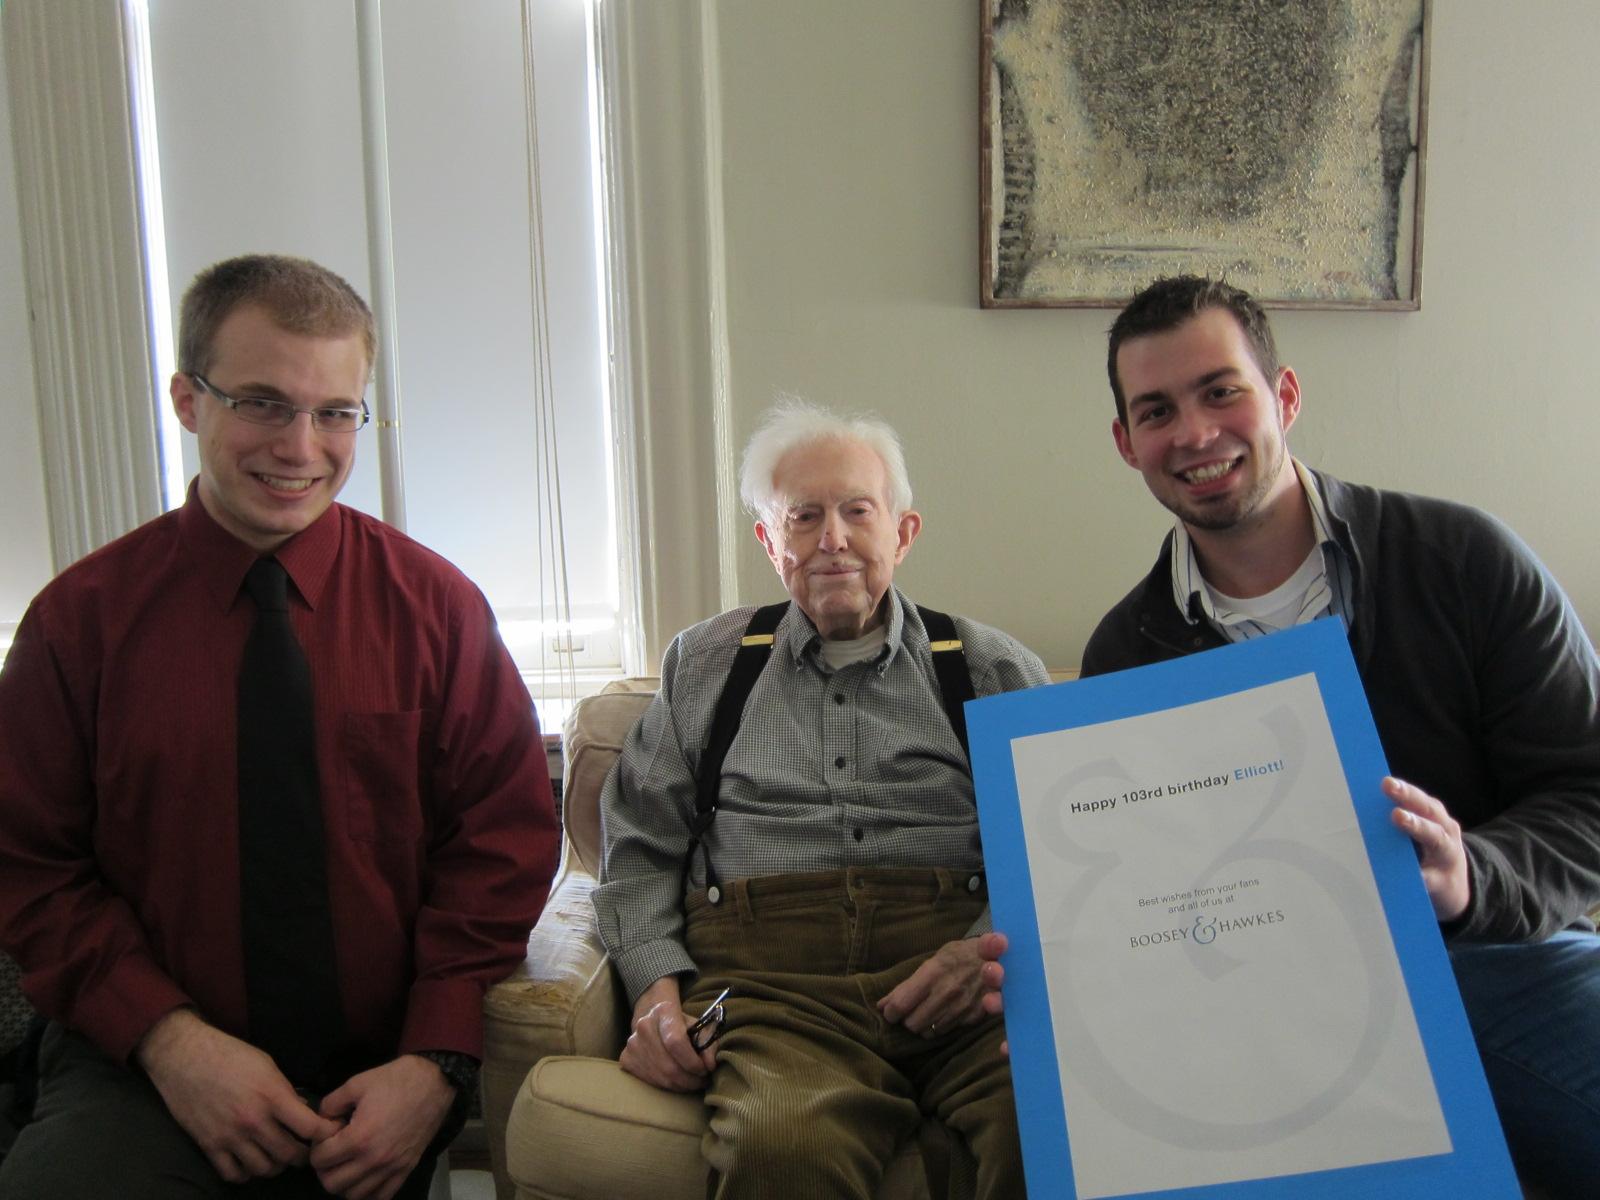 Presenting Elliott Carter with his 103rd birthday card.